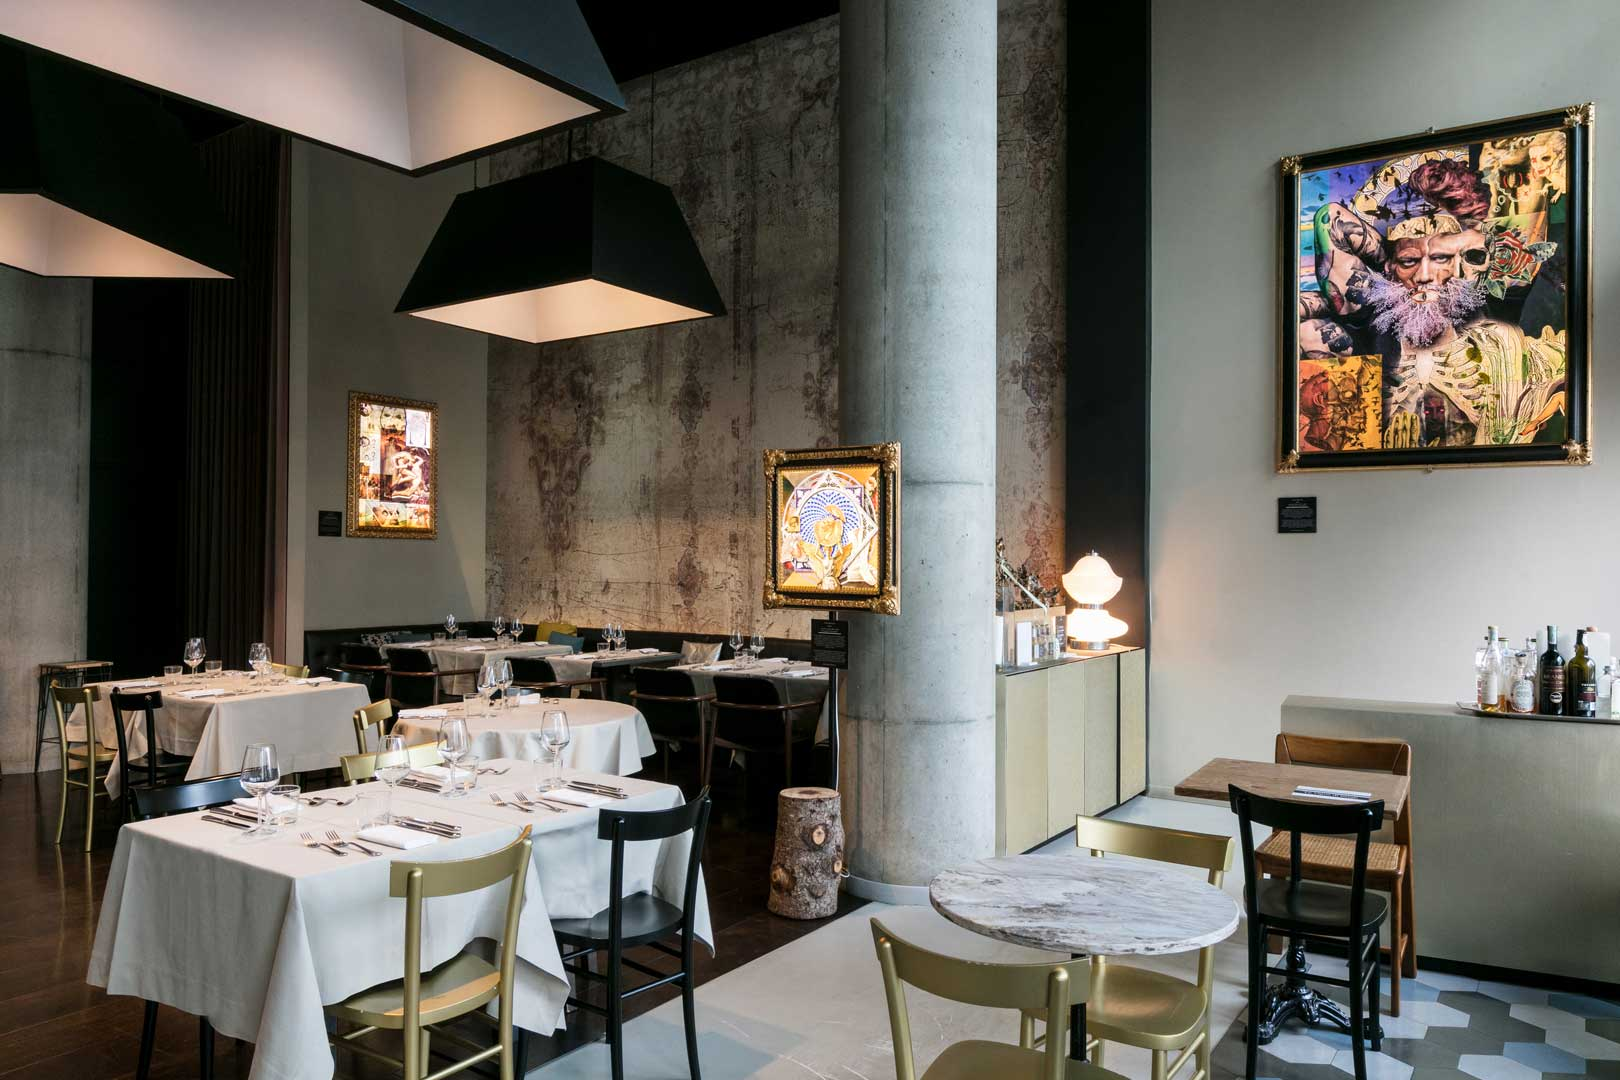 Il Santa - Bistrò Moderno   Milano